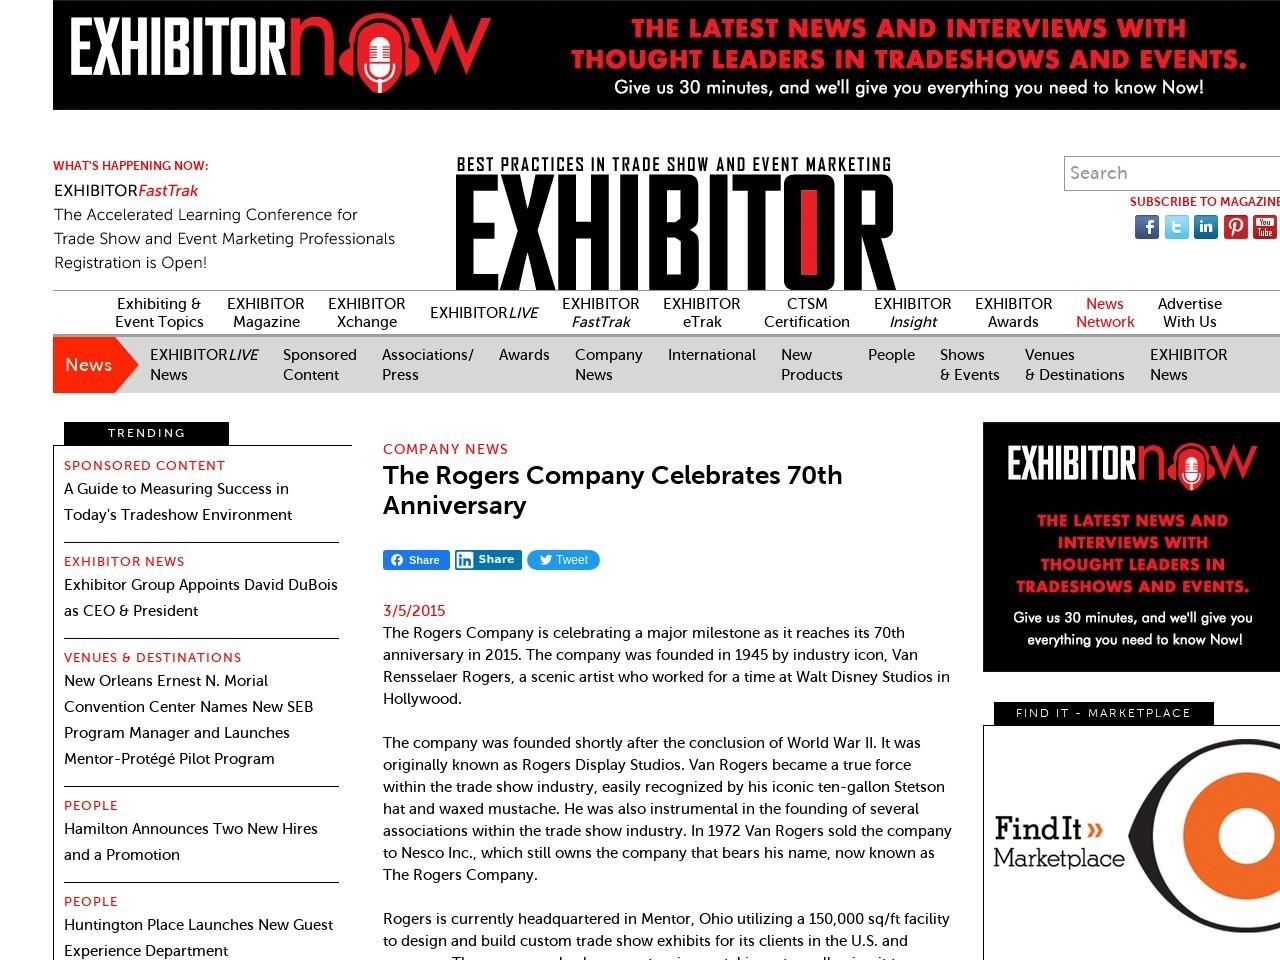 The Rogers Company Celebrates 70th Anniversary